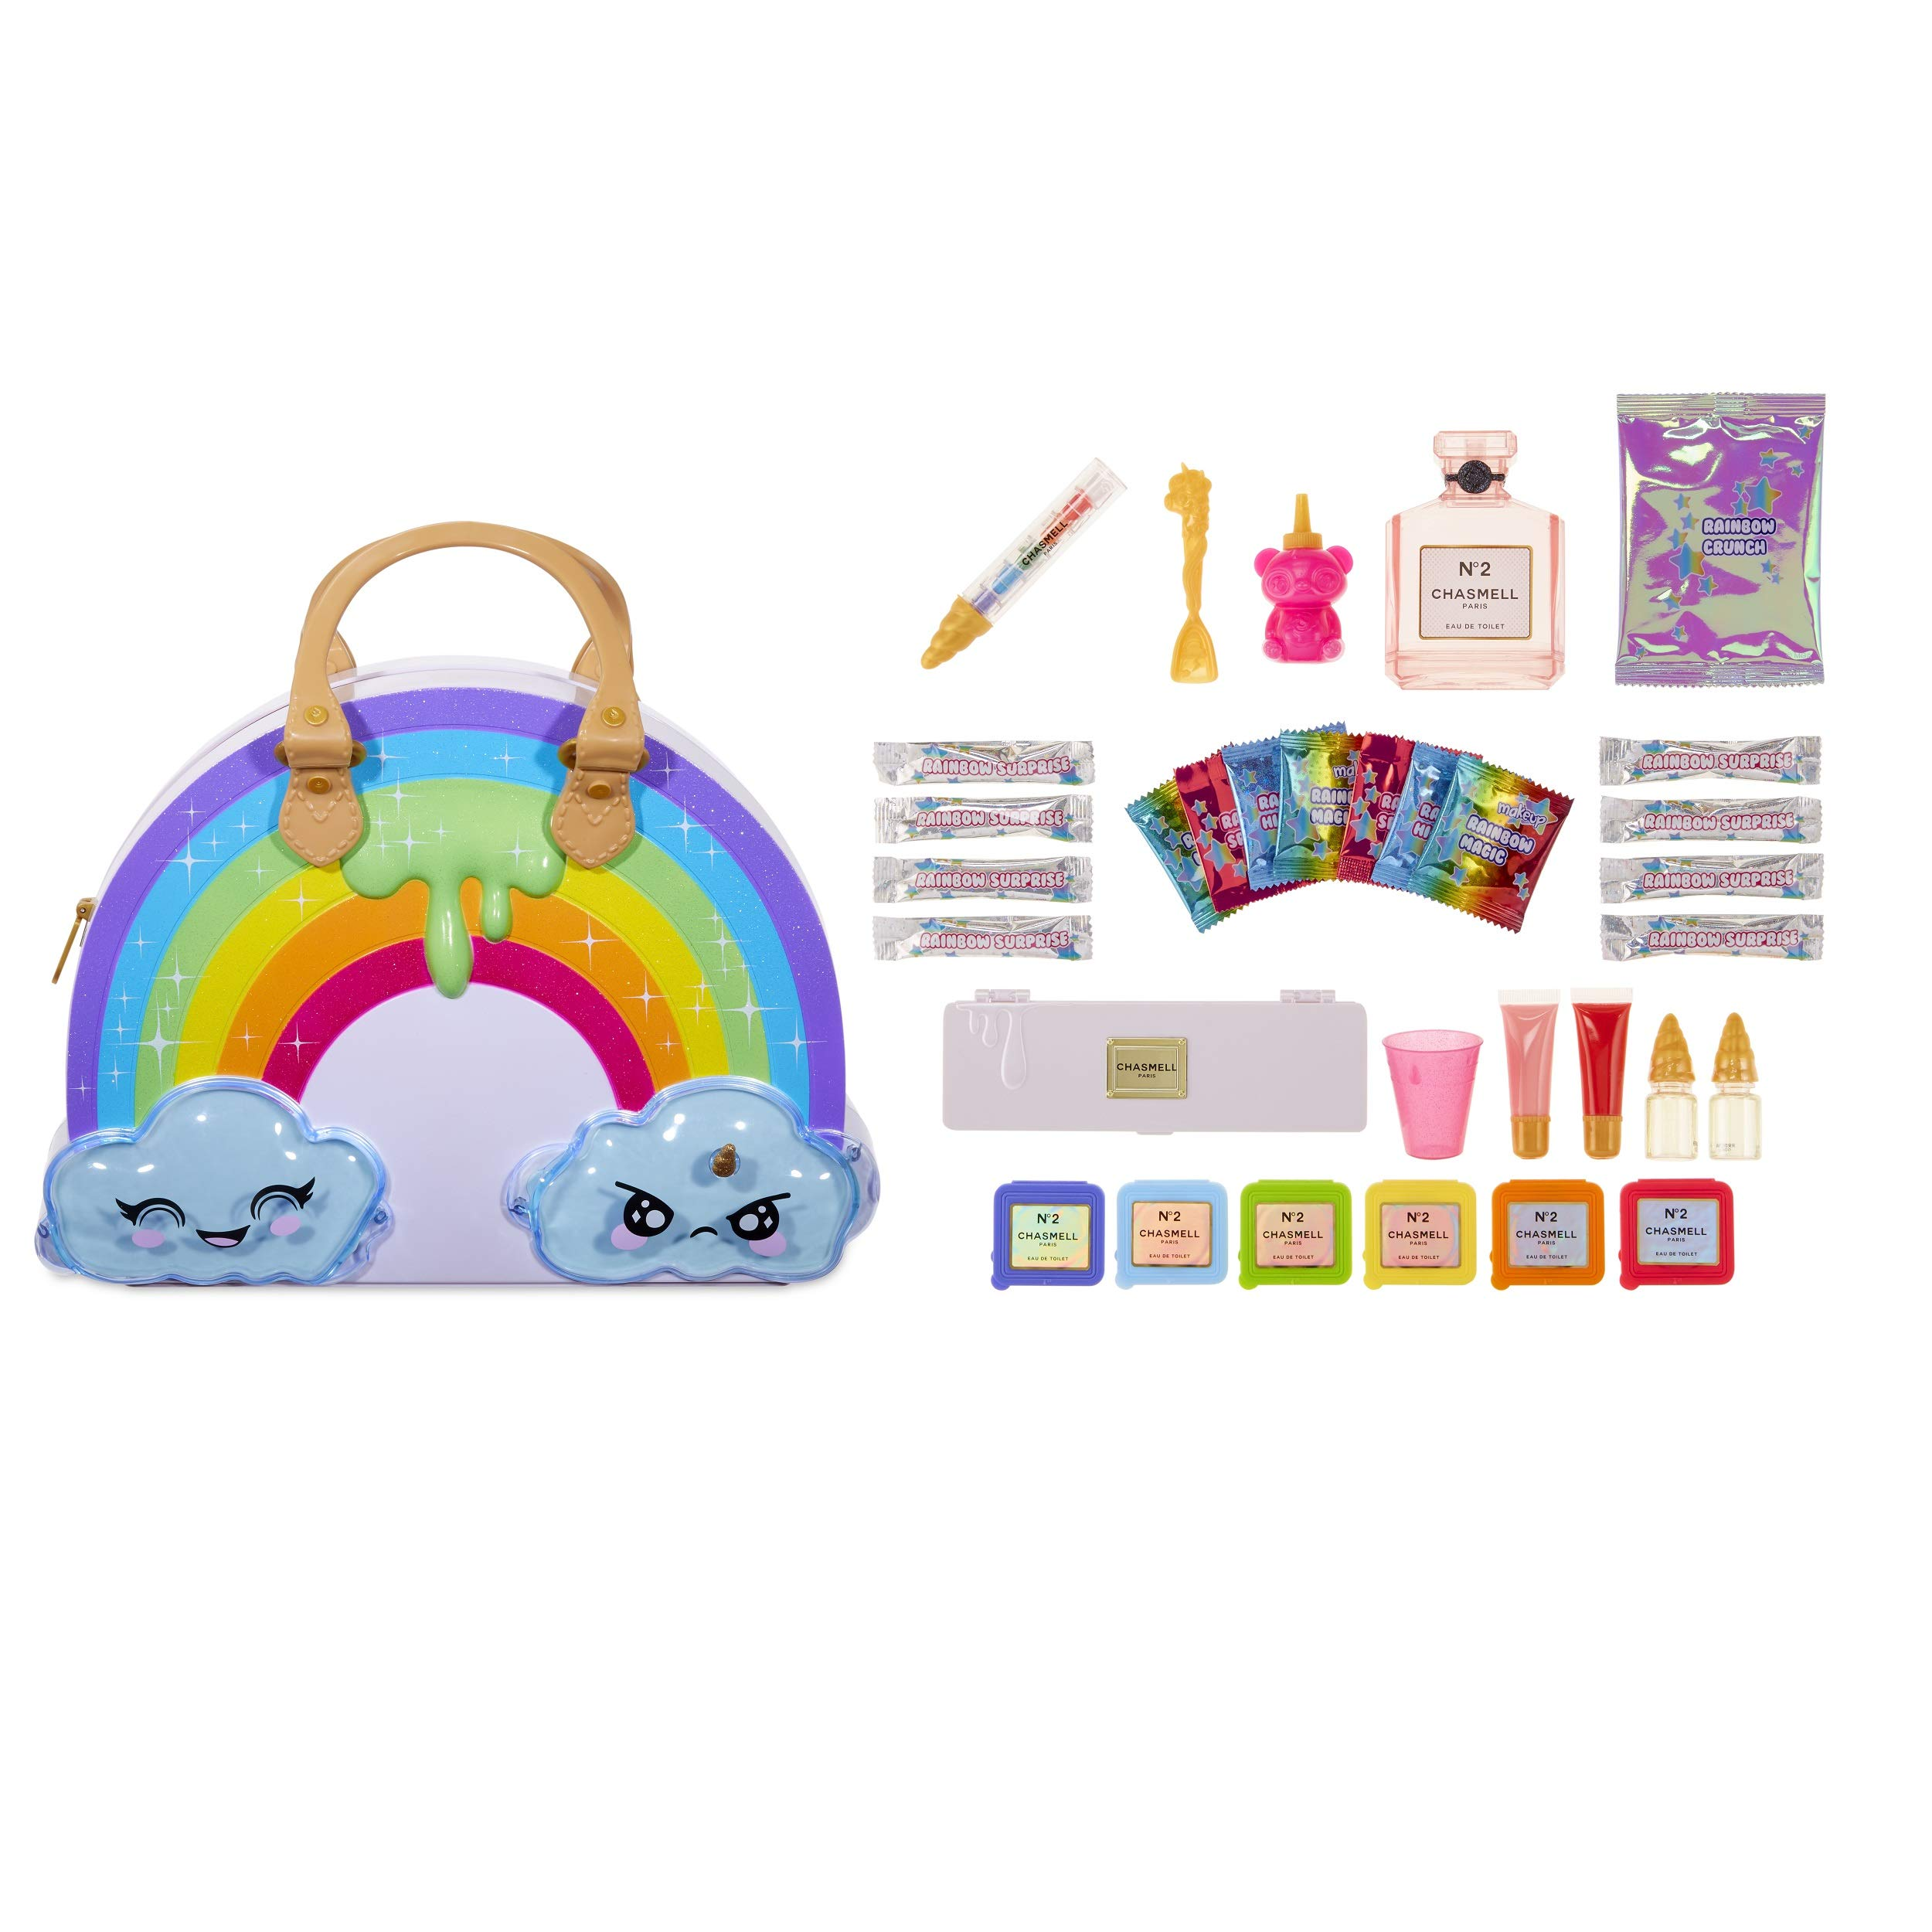 Poopsie Rainbow Slime Kit with 35+ Makeup & Slime Surprises